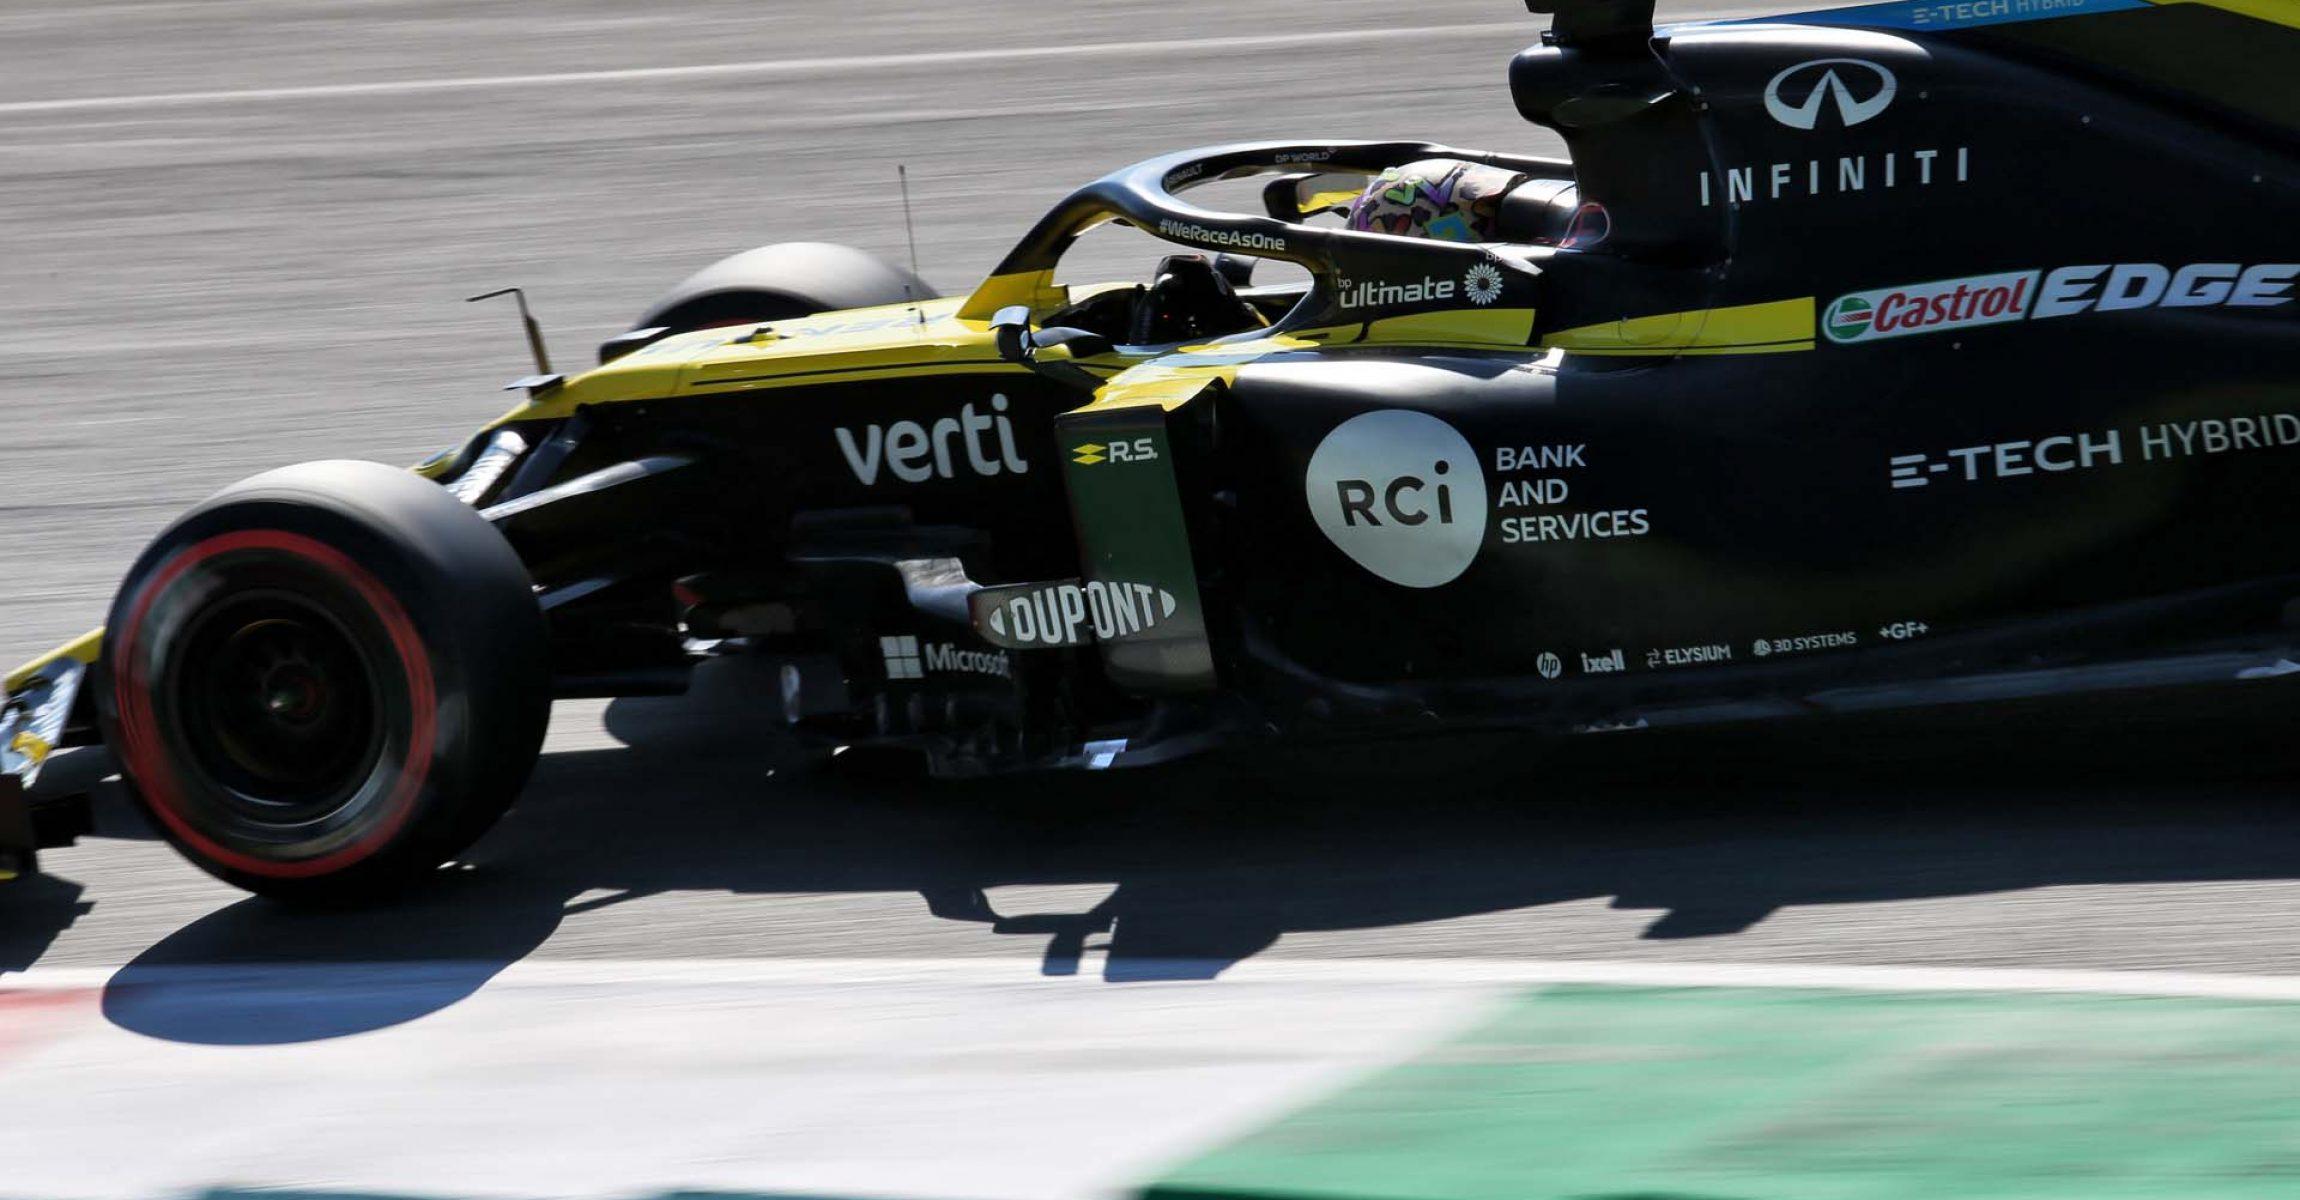 Daniel Ricciardo (AUS) Renault F1 Team RS20. Tuscan Grand Prix, Saturday 12th September 2020. Mugello Italy.